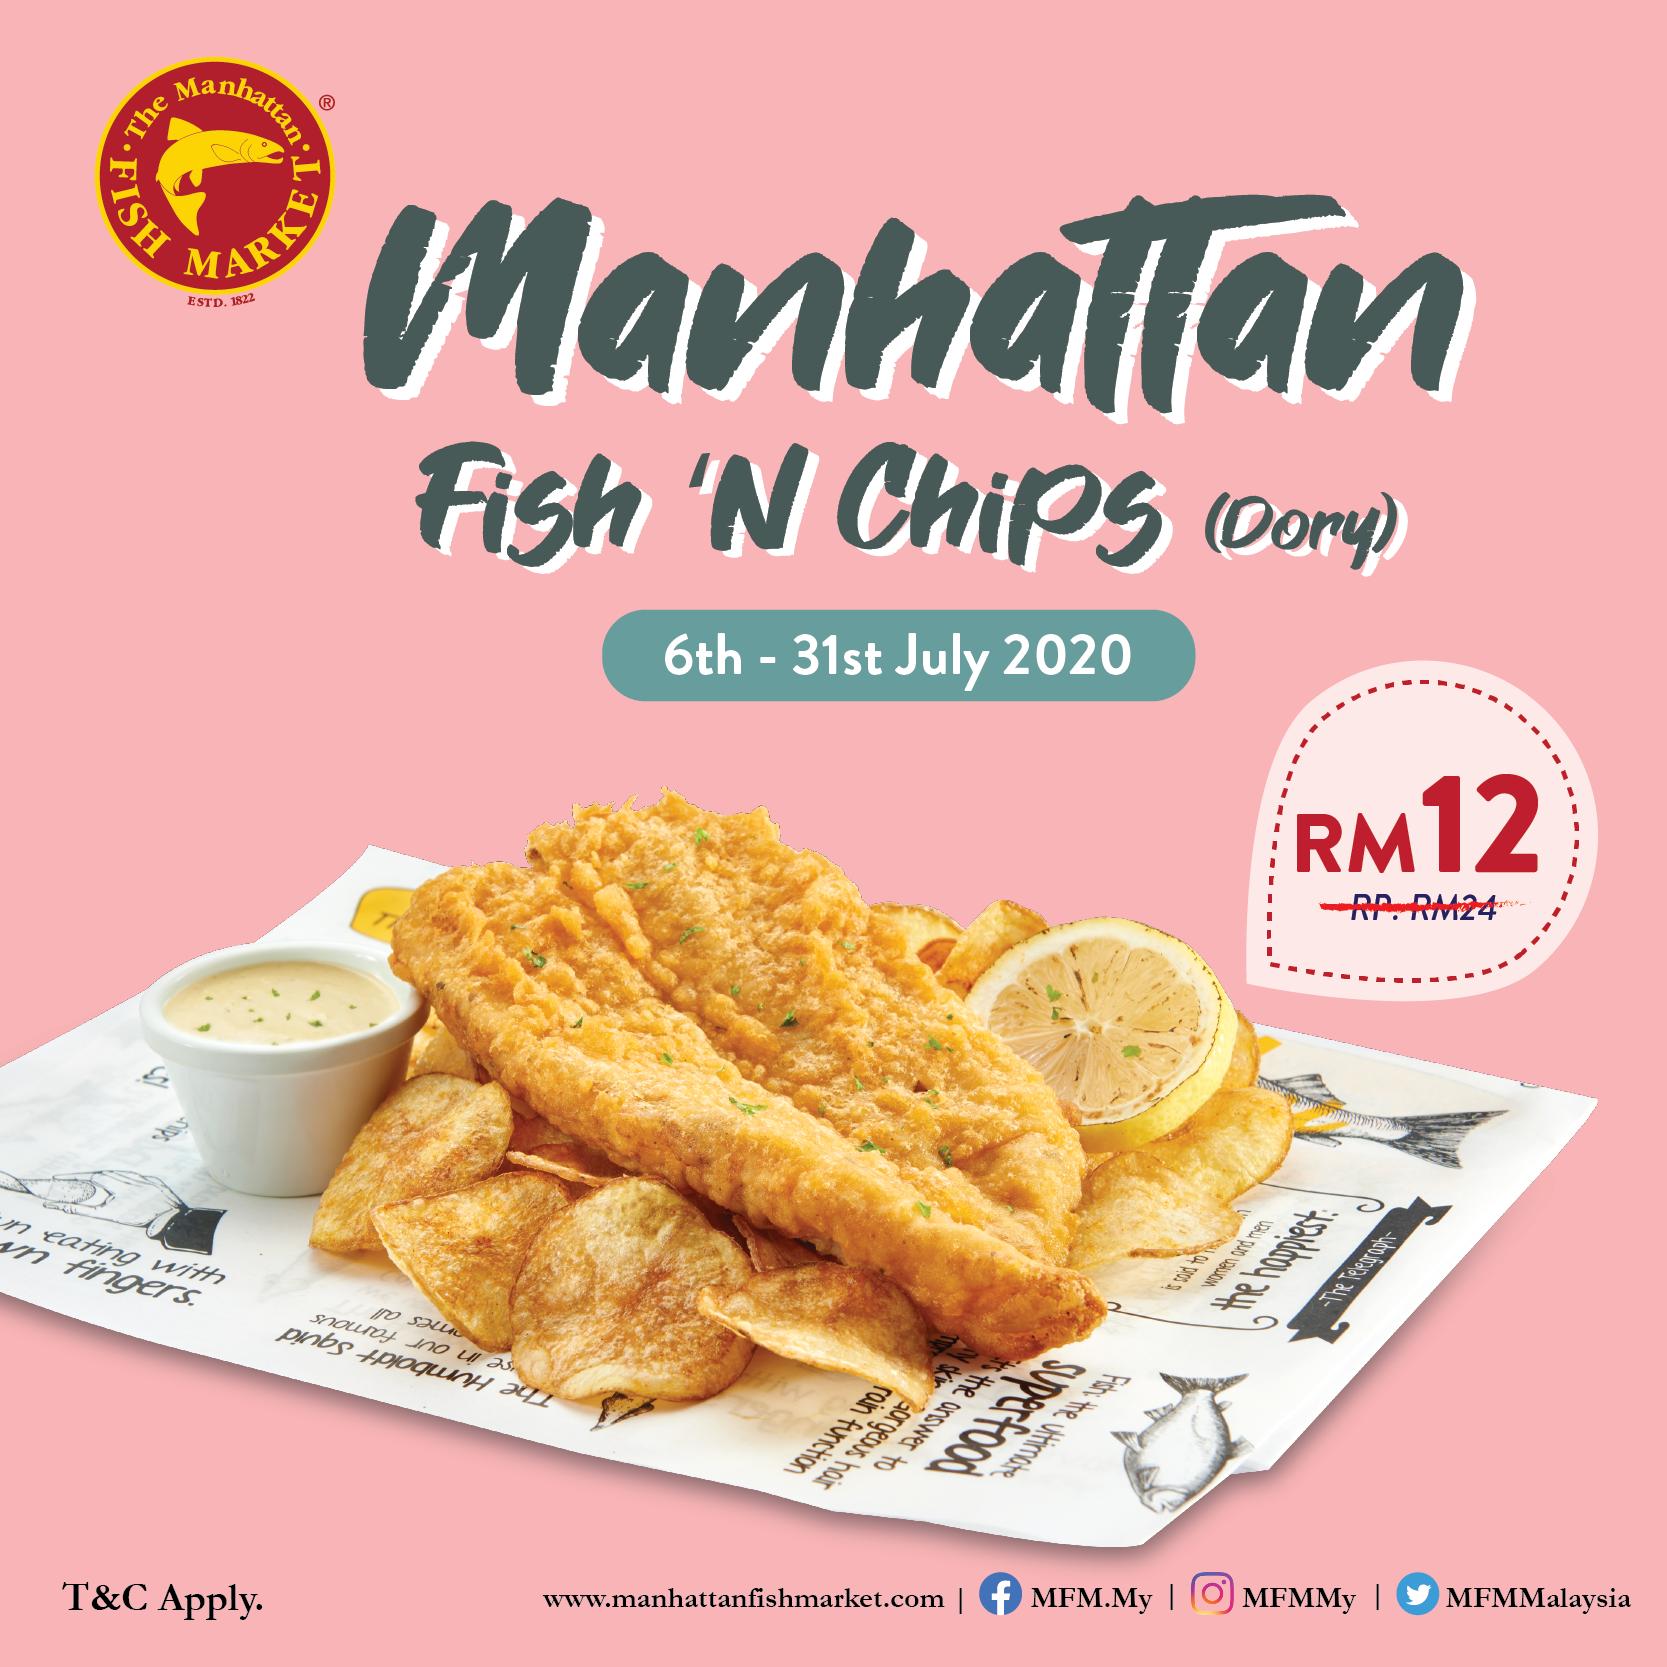 Manhattan-Fish-Market-Fish-n-Chips-Dory